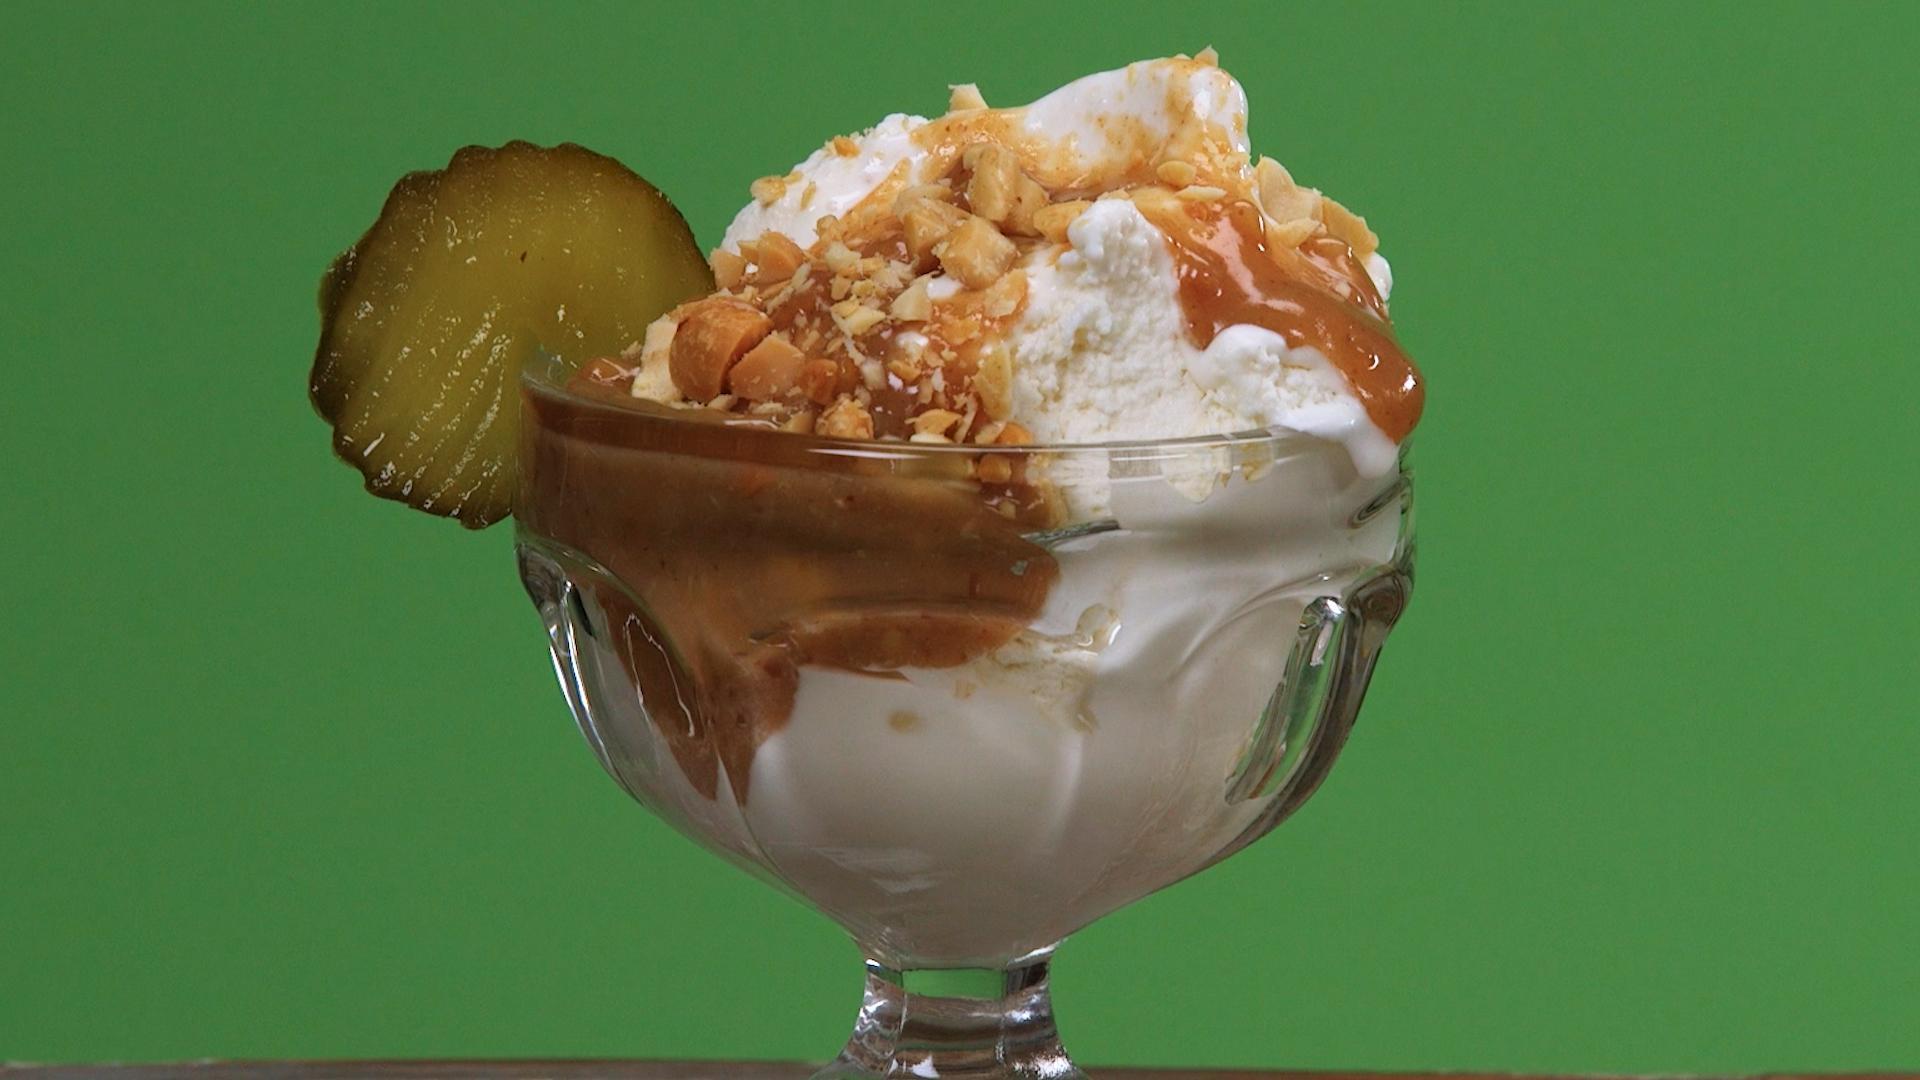 The Best Pickle Flavored Ice Cream Recipes on Yummly | Umeboshi Pickled Plum Ice Cream, Matcha Ice Cream - 抹茶アイスクリーム レシピ, Naked Chocolate Ice Cream.